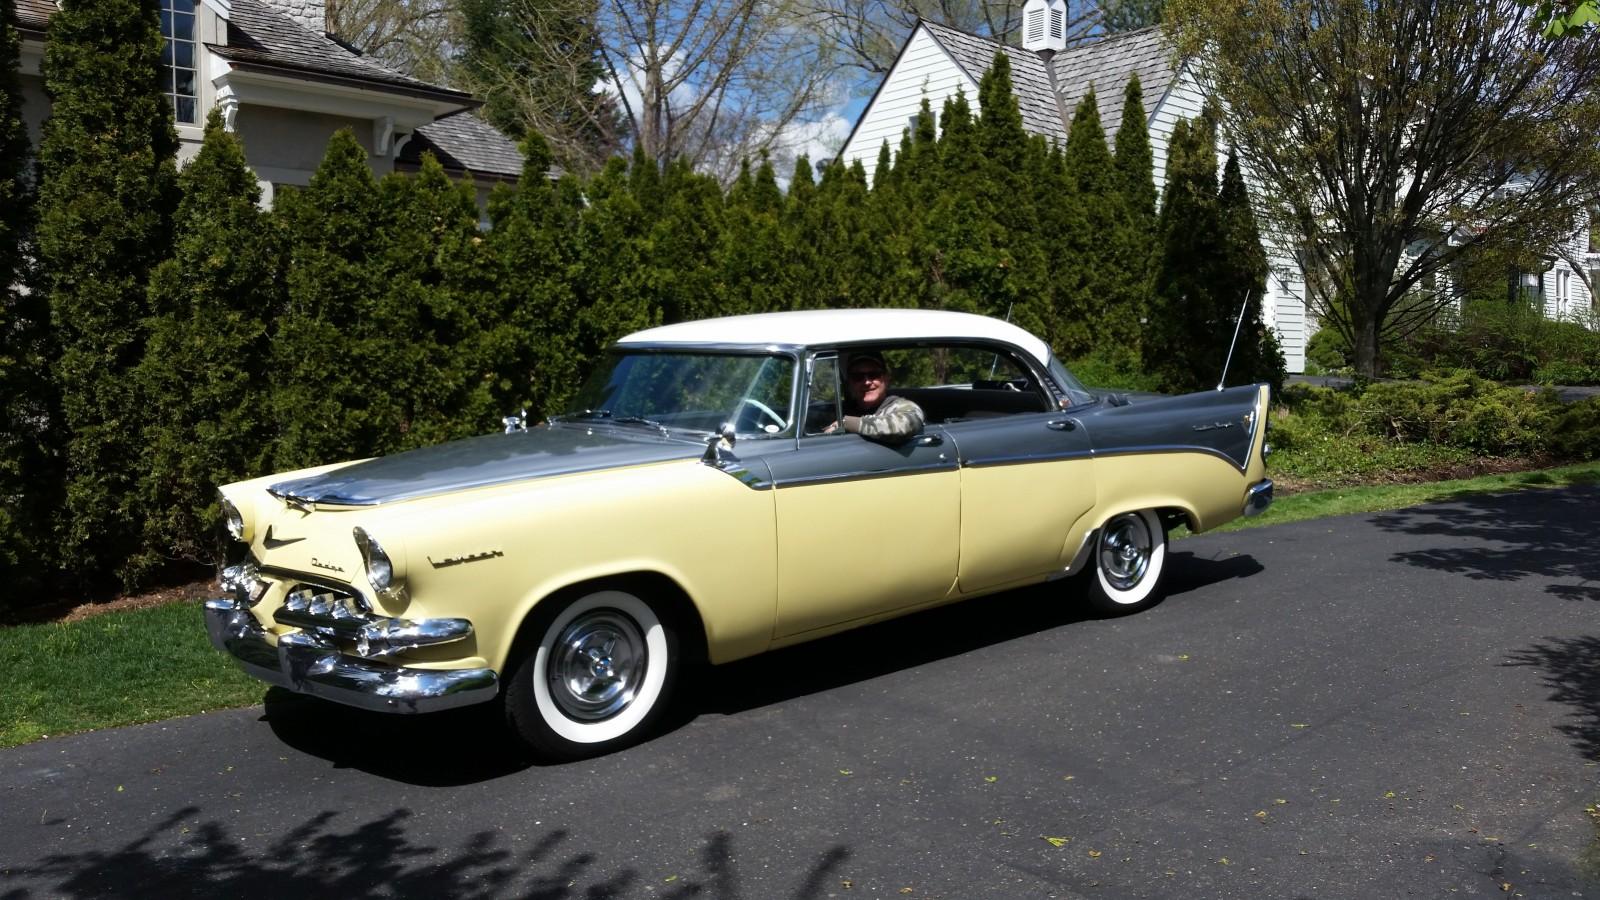 1955 dodge royal barn find for sale - My Custom Royal